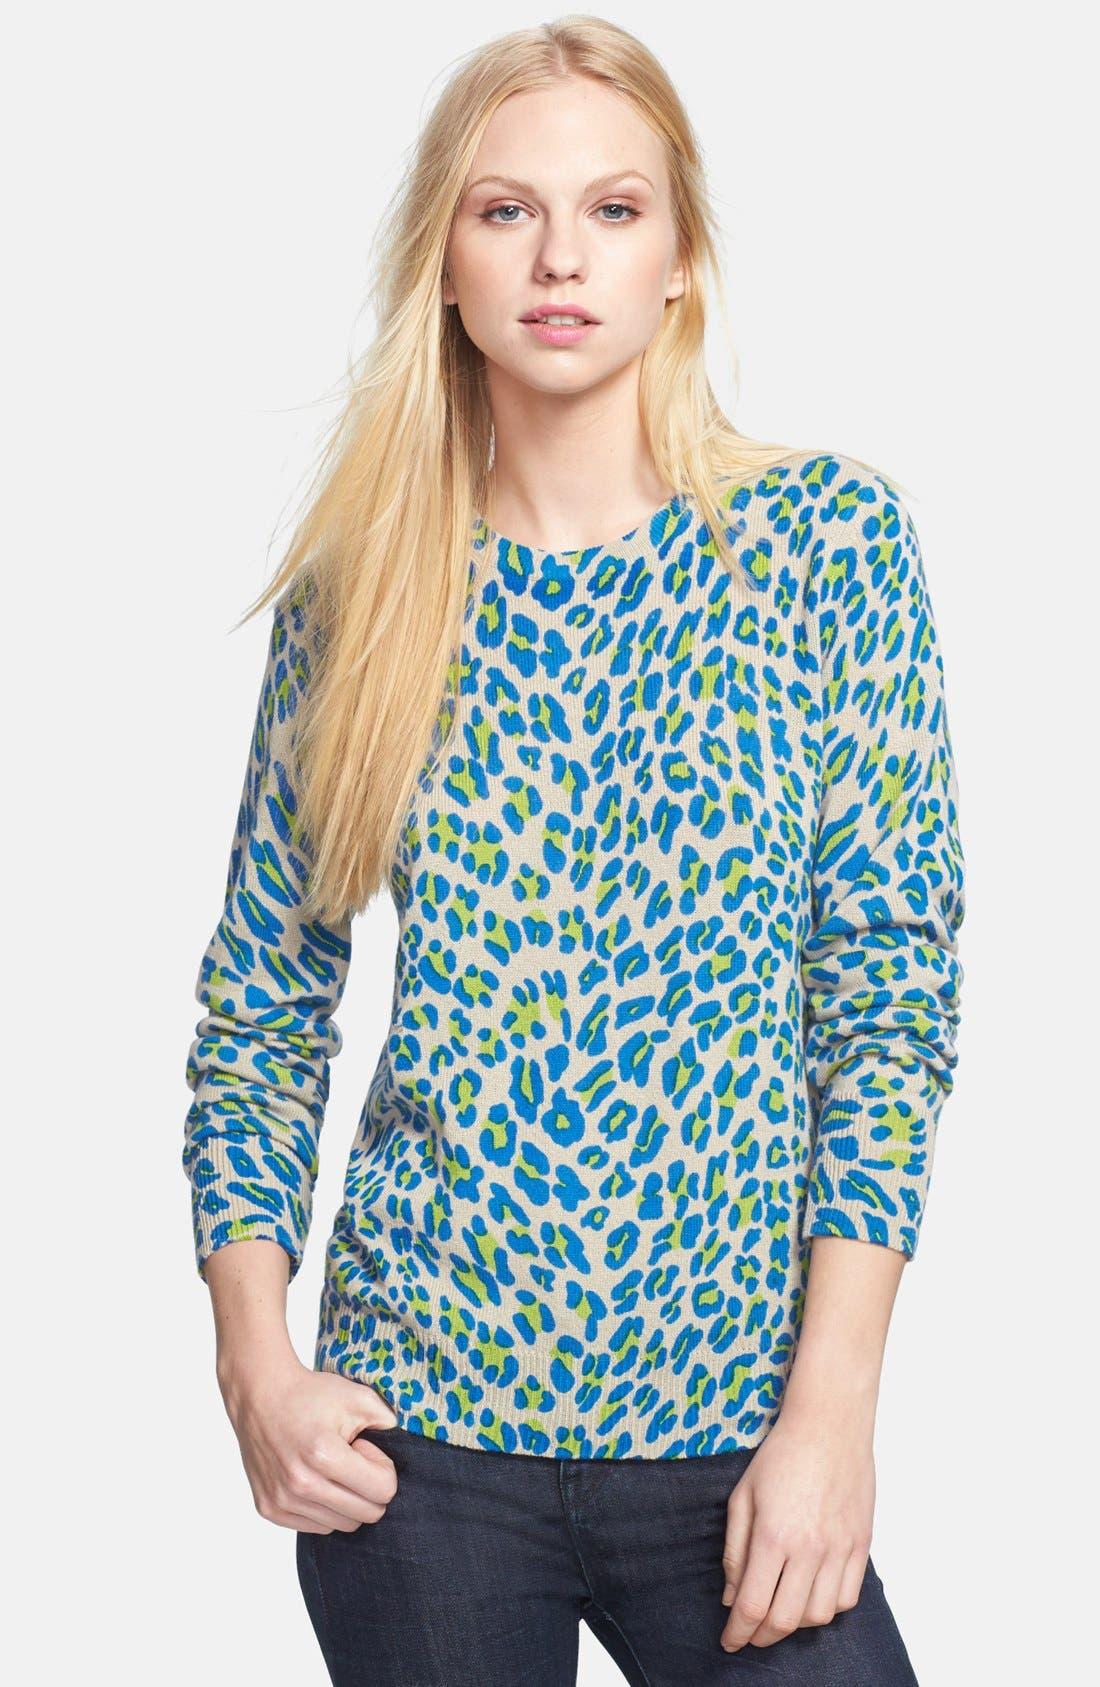 Main Image - Equipment 'Shane' Leopard Spot Cashmere Sweater